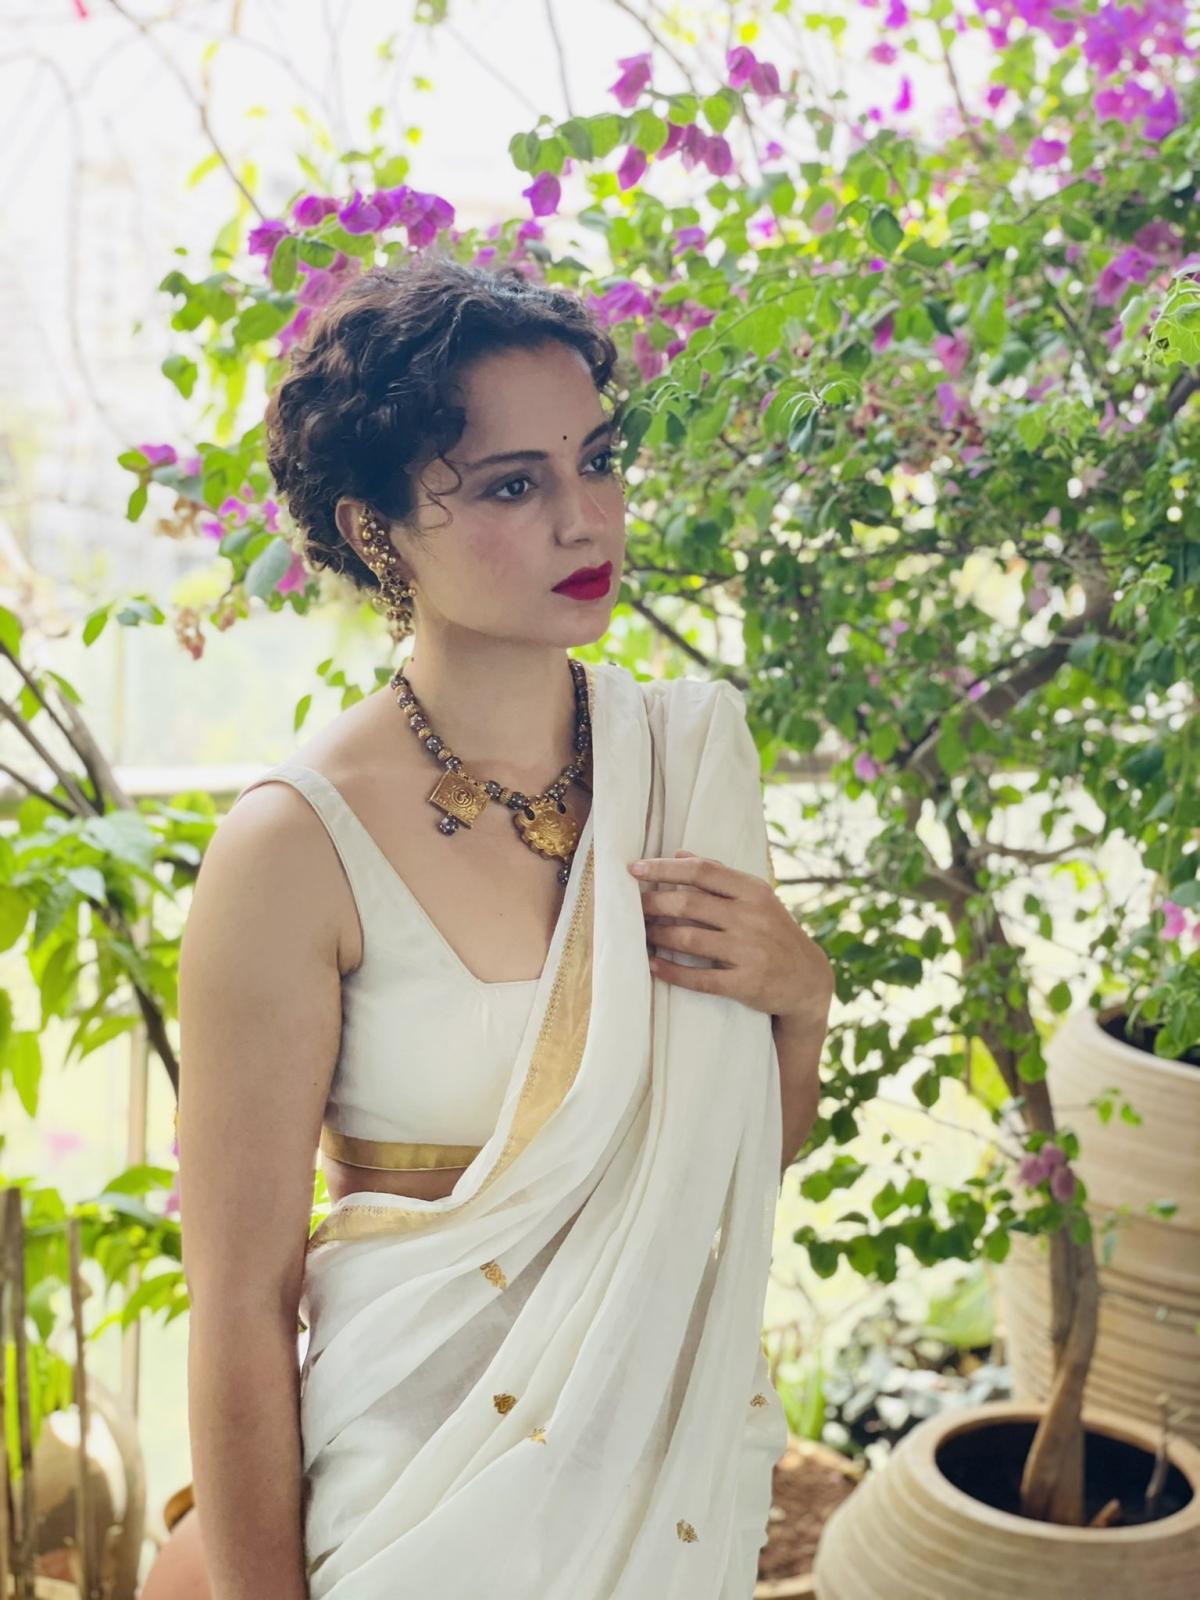 FPJ Fashion Police: Kangana Ranaut pairs white saree with Rs 7, 500 money clutch